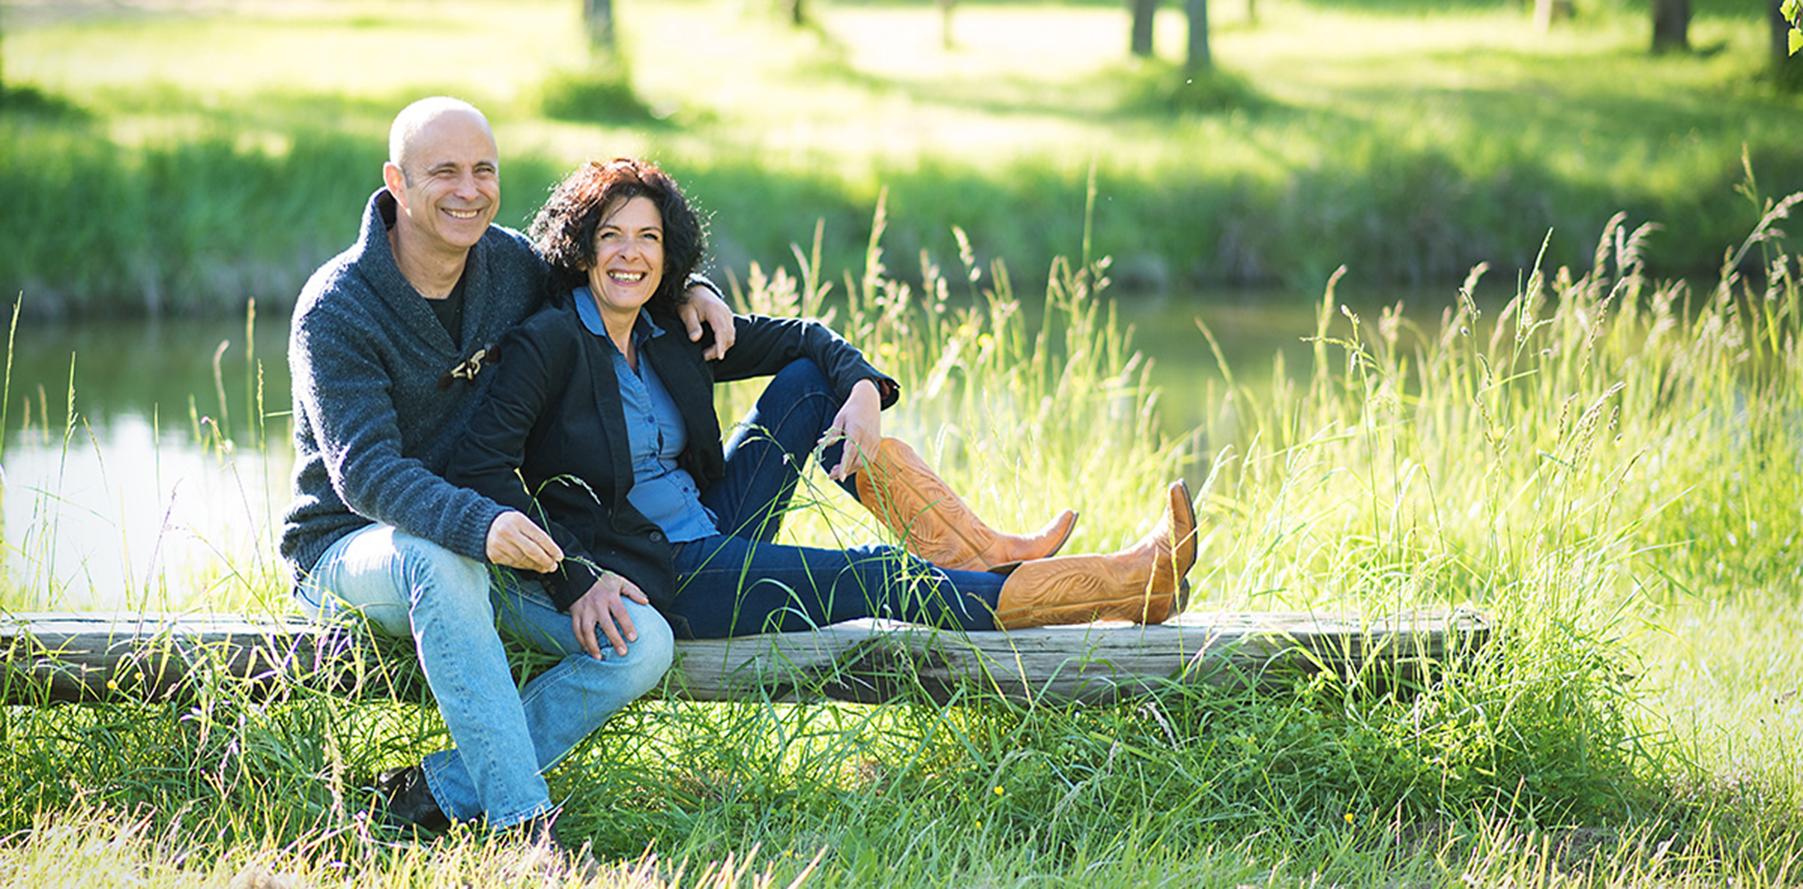 phot-couple-oleronmarais-arceau-copie